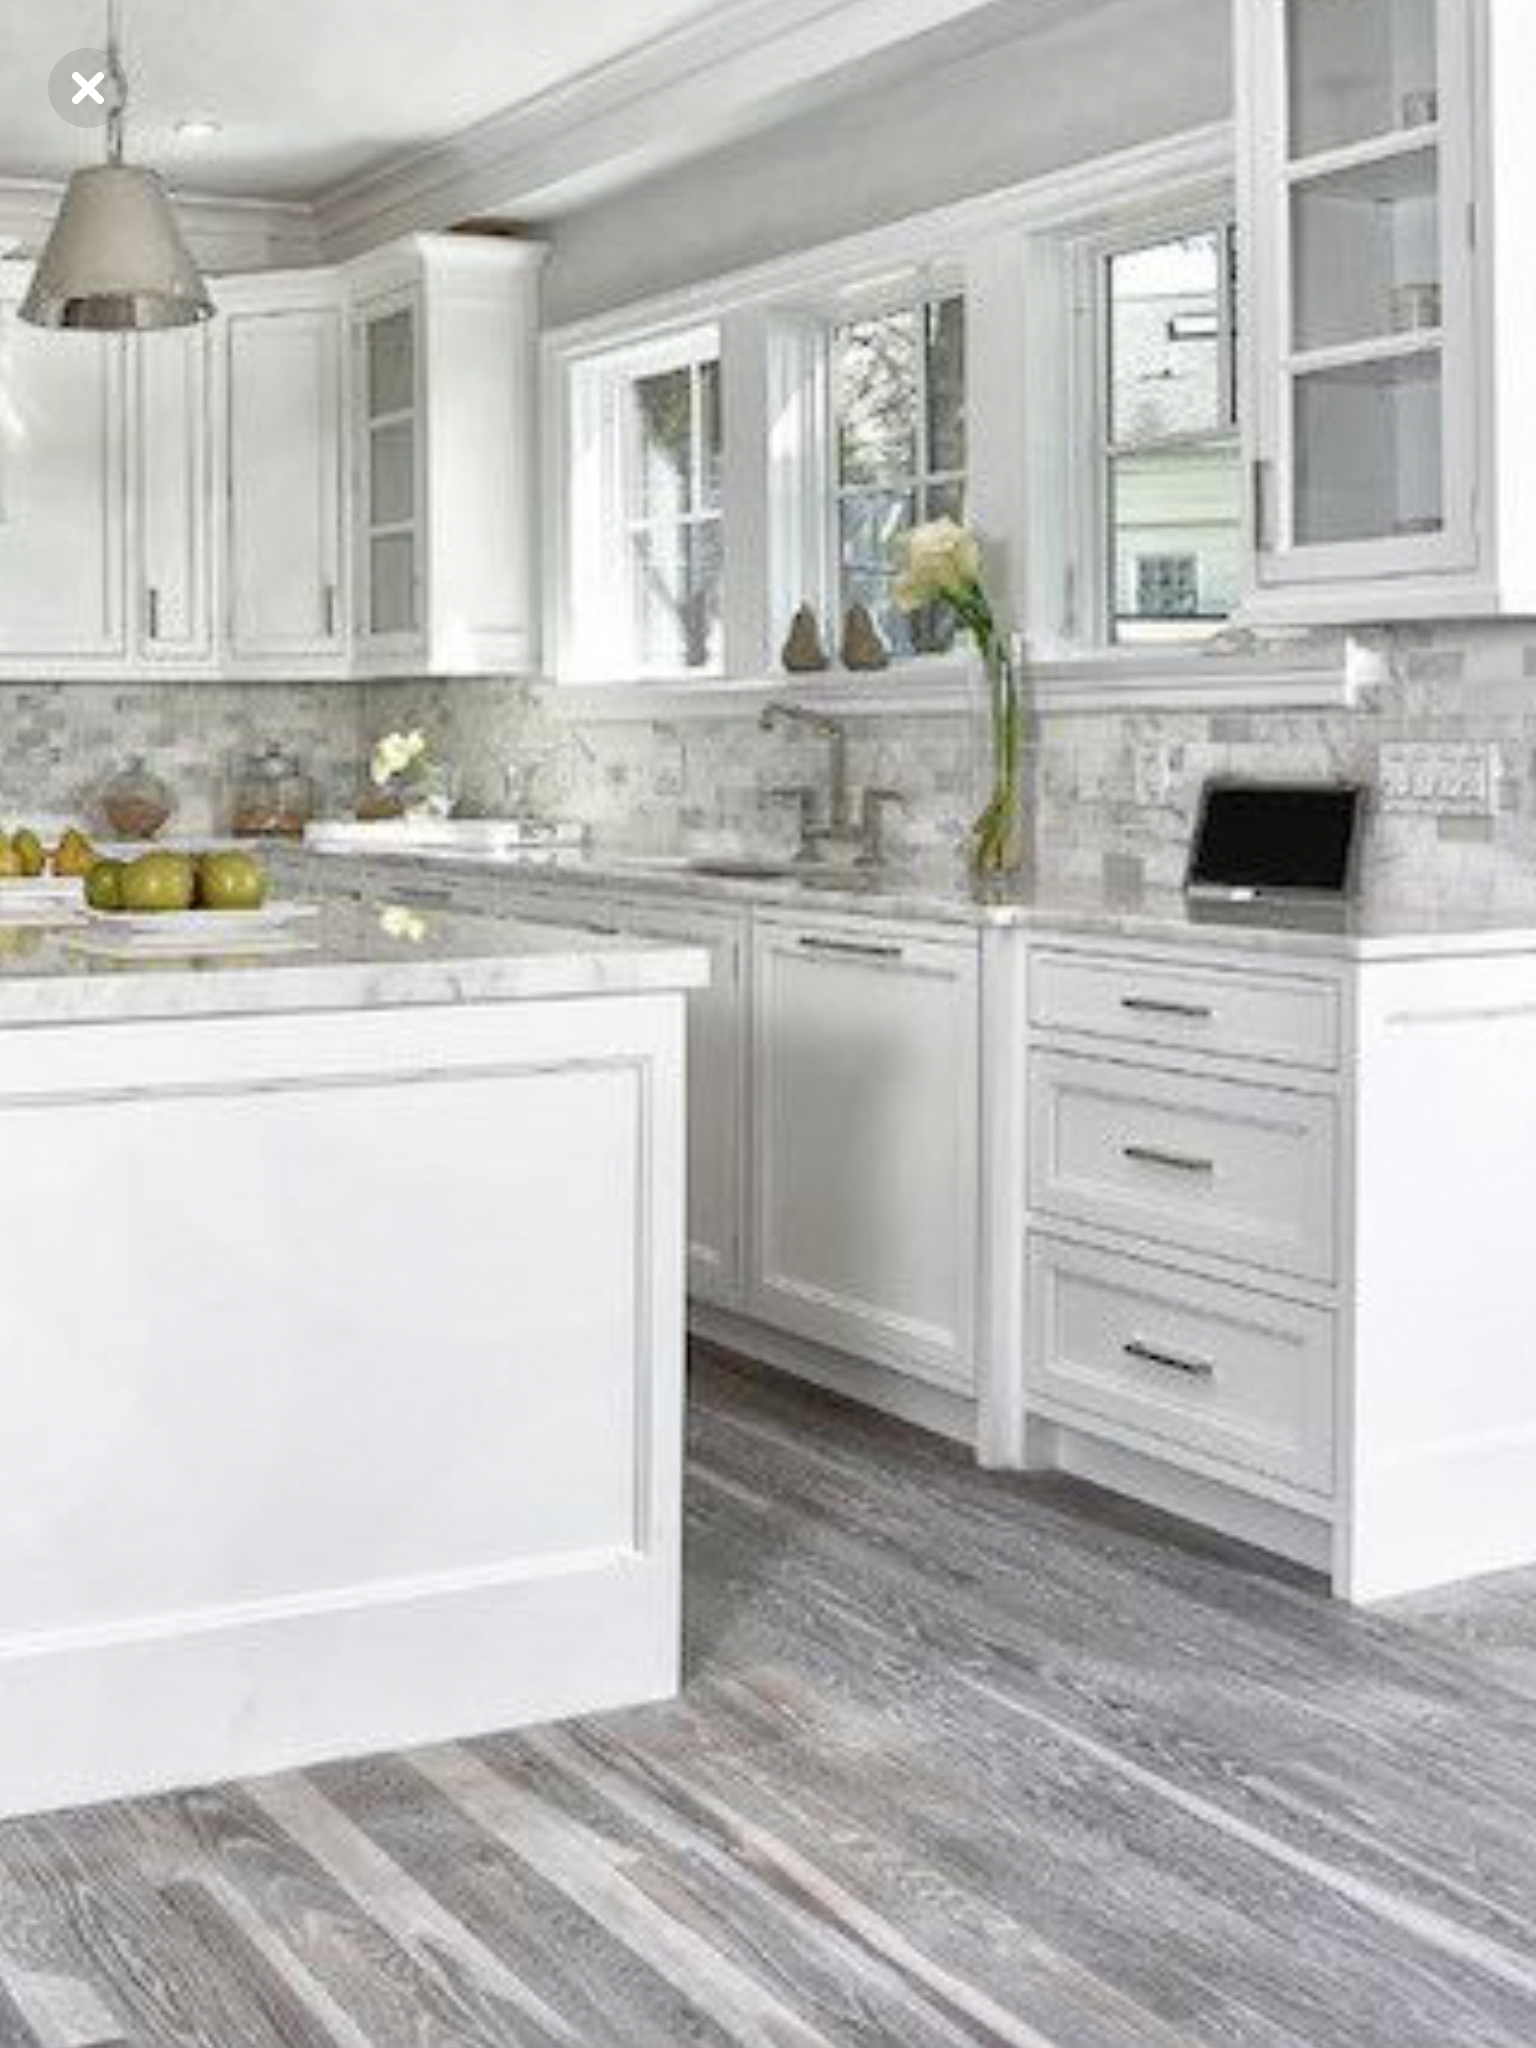 My Friends Gorgeous Gray And White Kitchen Cuckoo4design Light Grey Kitchens White Kitchen Design Rustic Kitchen Cabinets